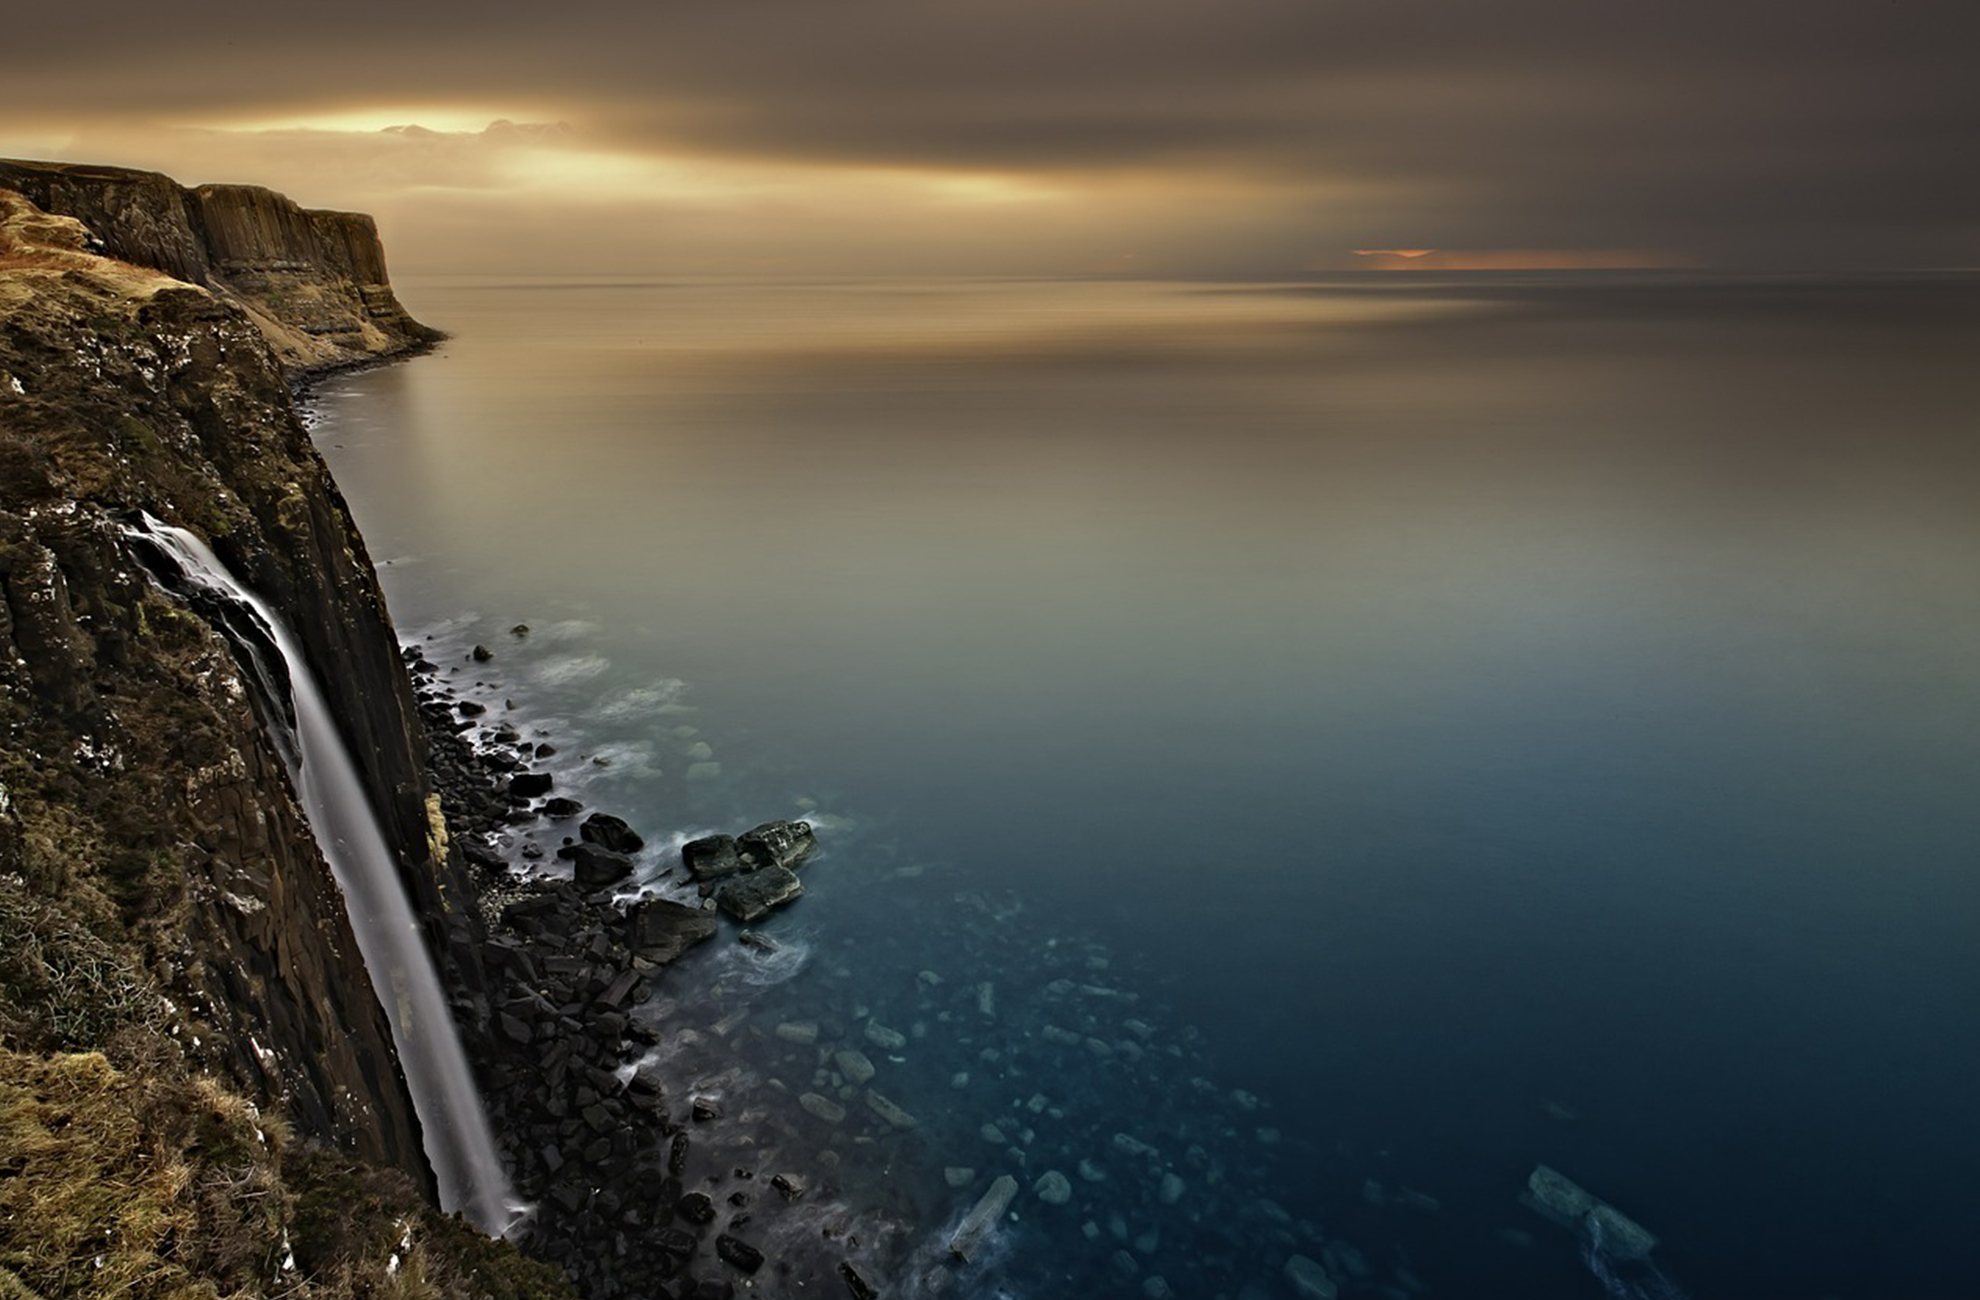 Isle of Skye in Scotland would make an amazing mini-moon location